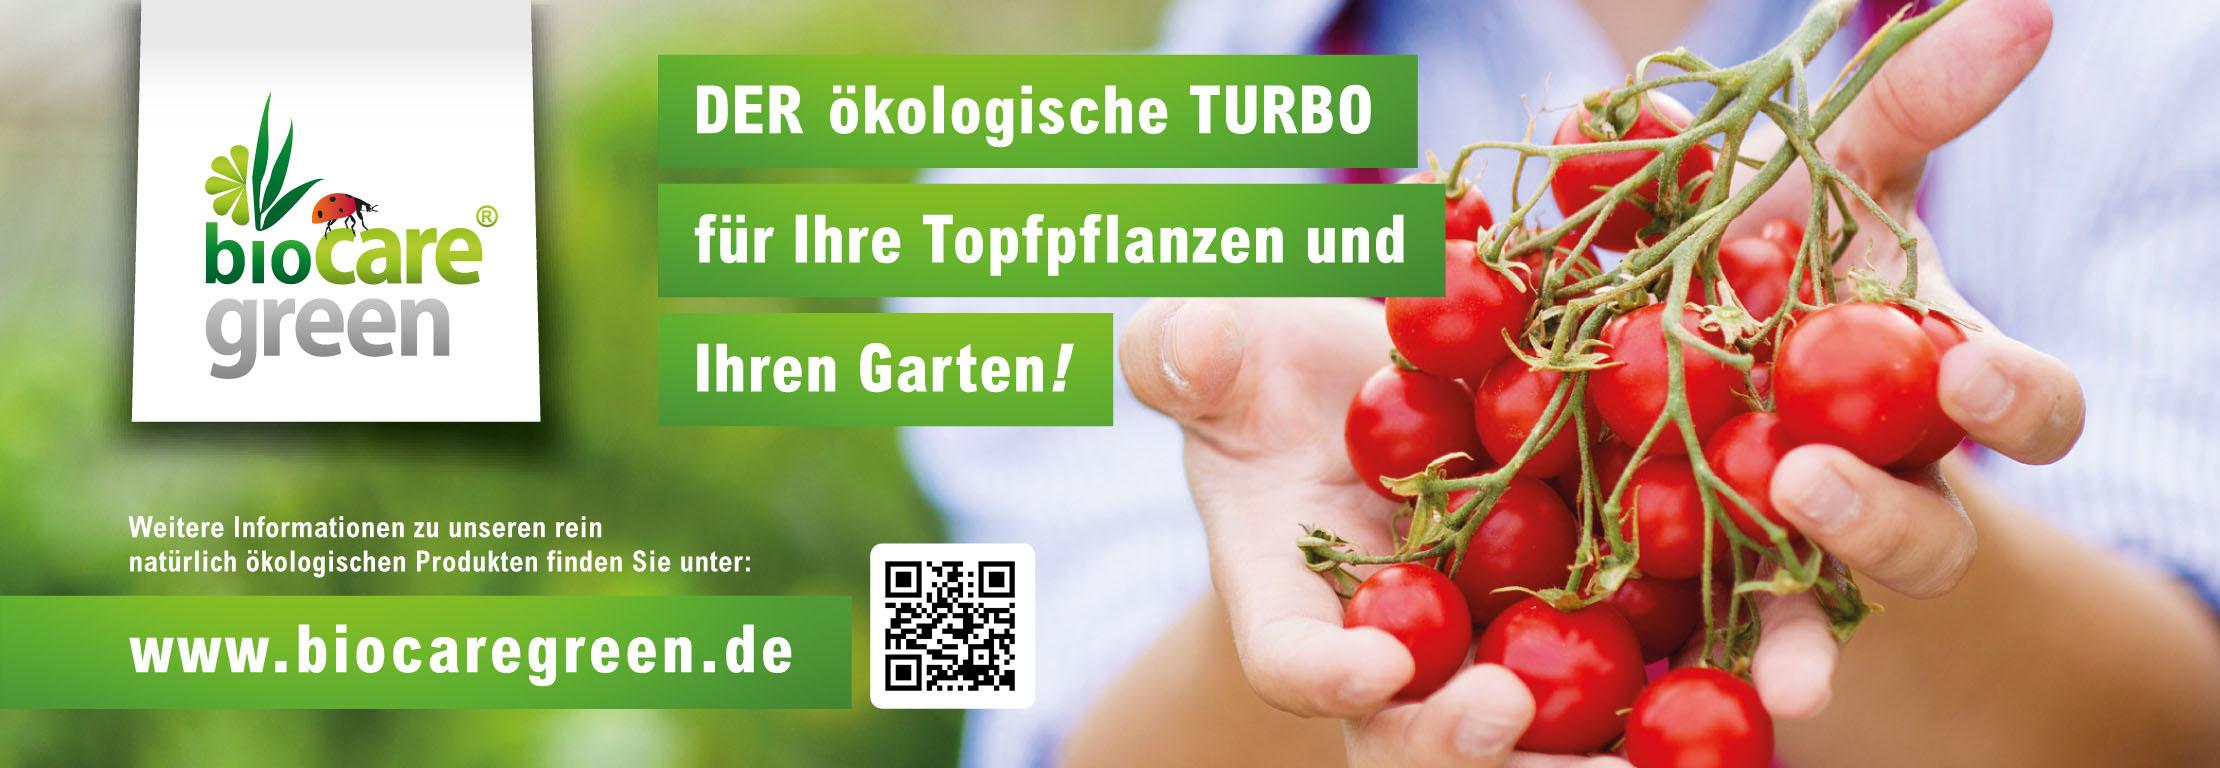 biocaregreen | Start